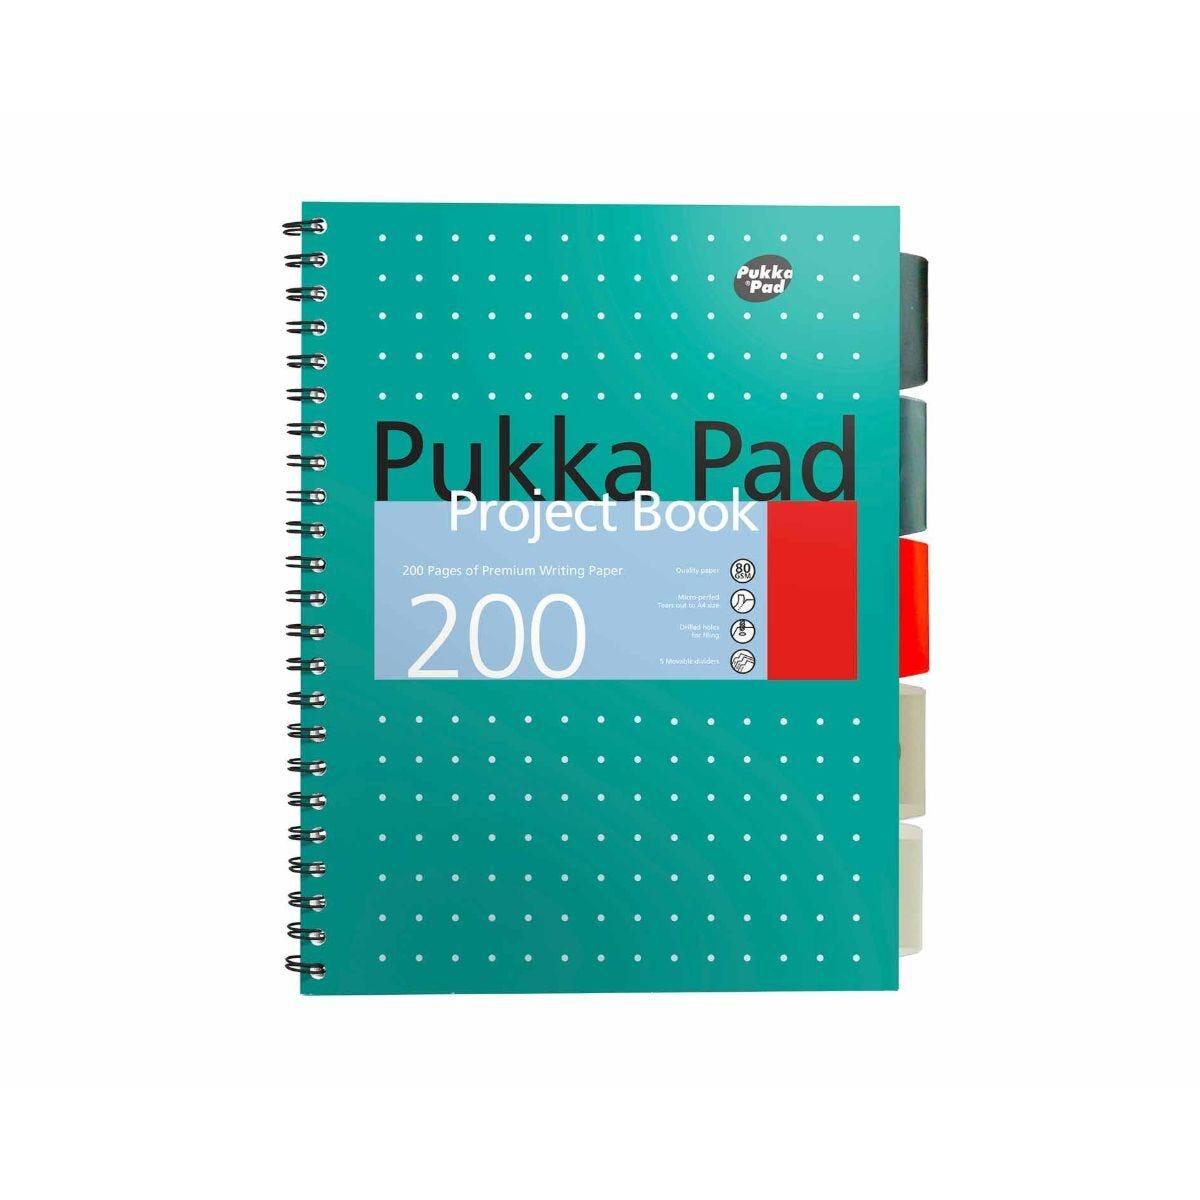 Pukka Project Book Pad A4 Metallic